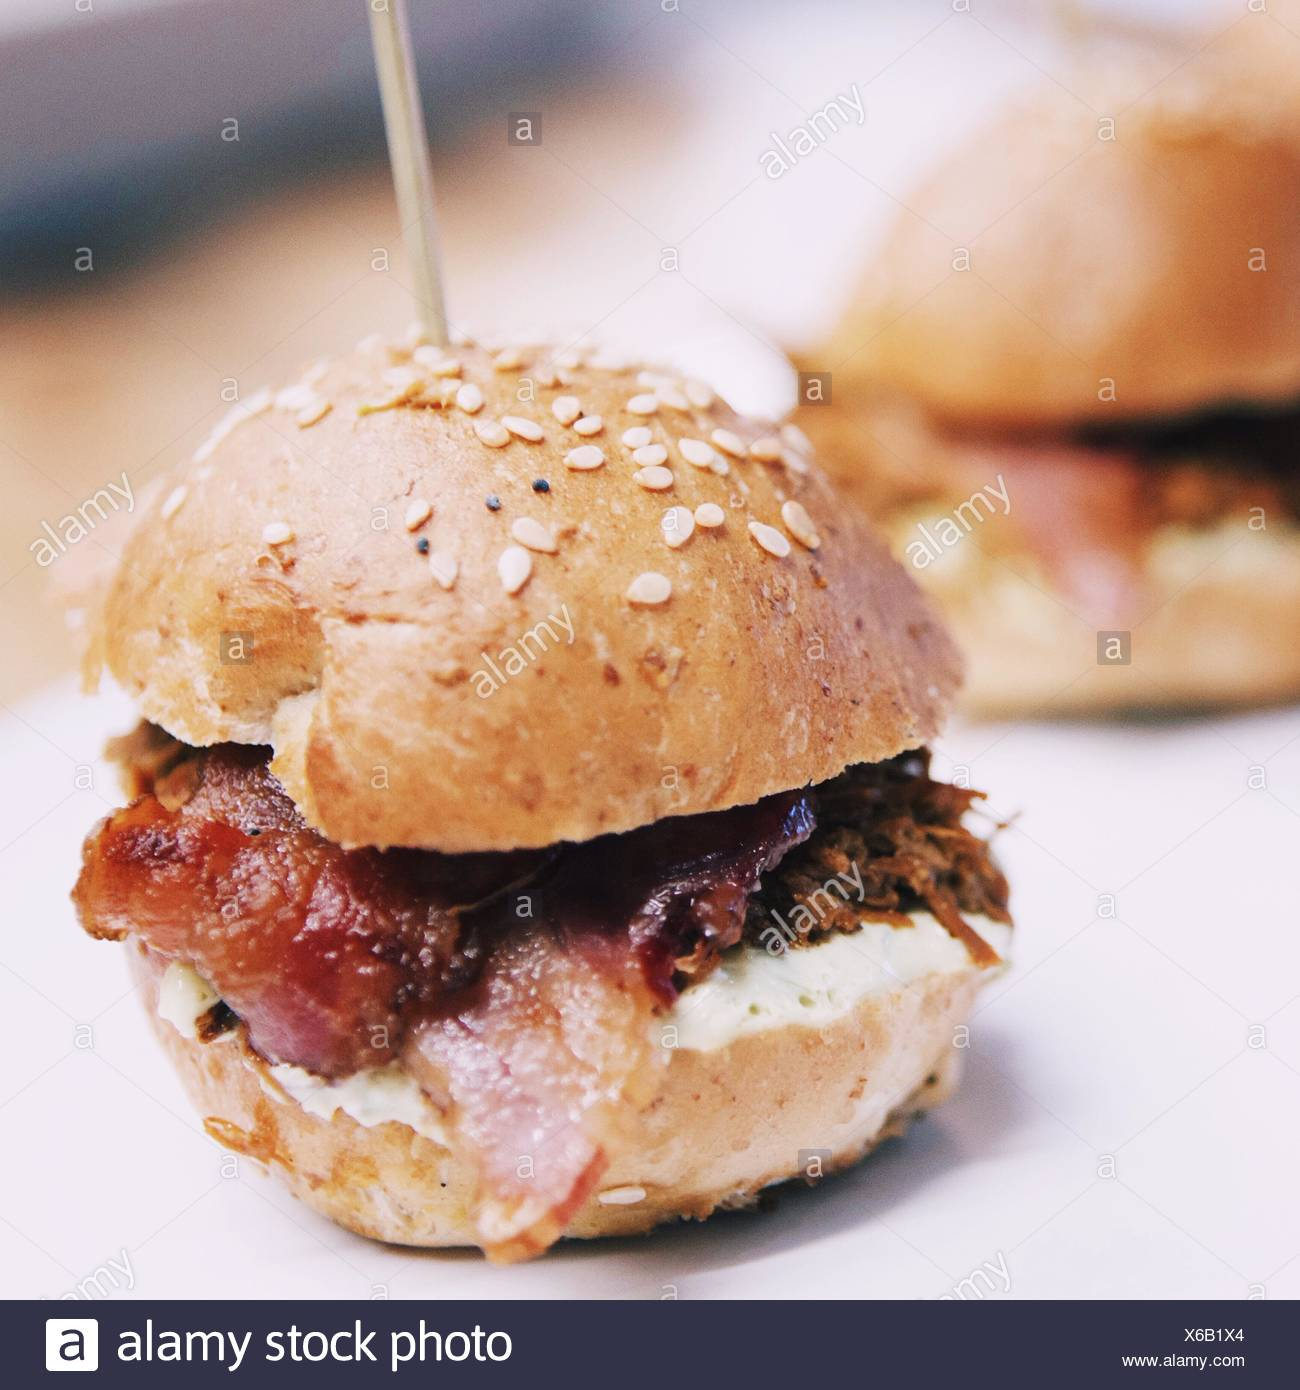 Nahaufnahme der Hamburger am Tisch serviert Stockbild